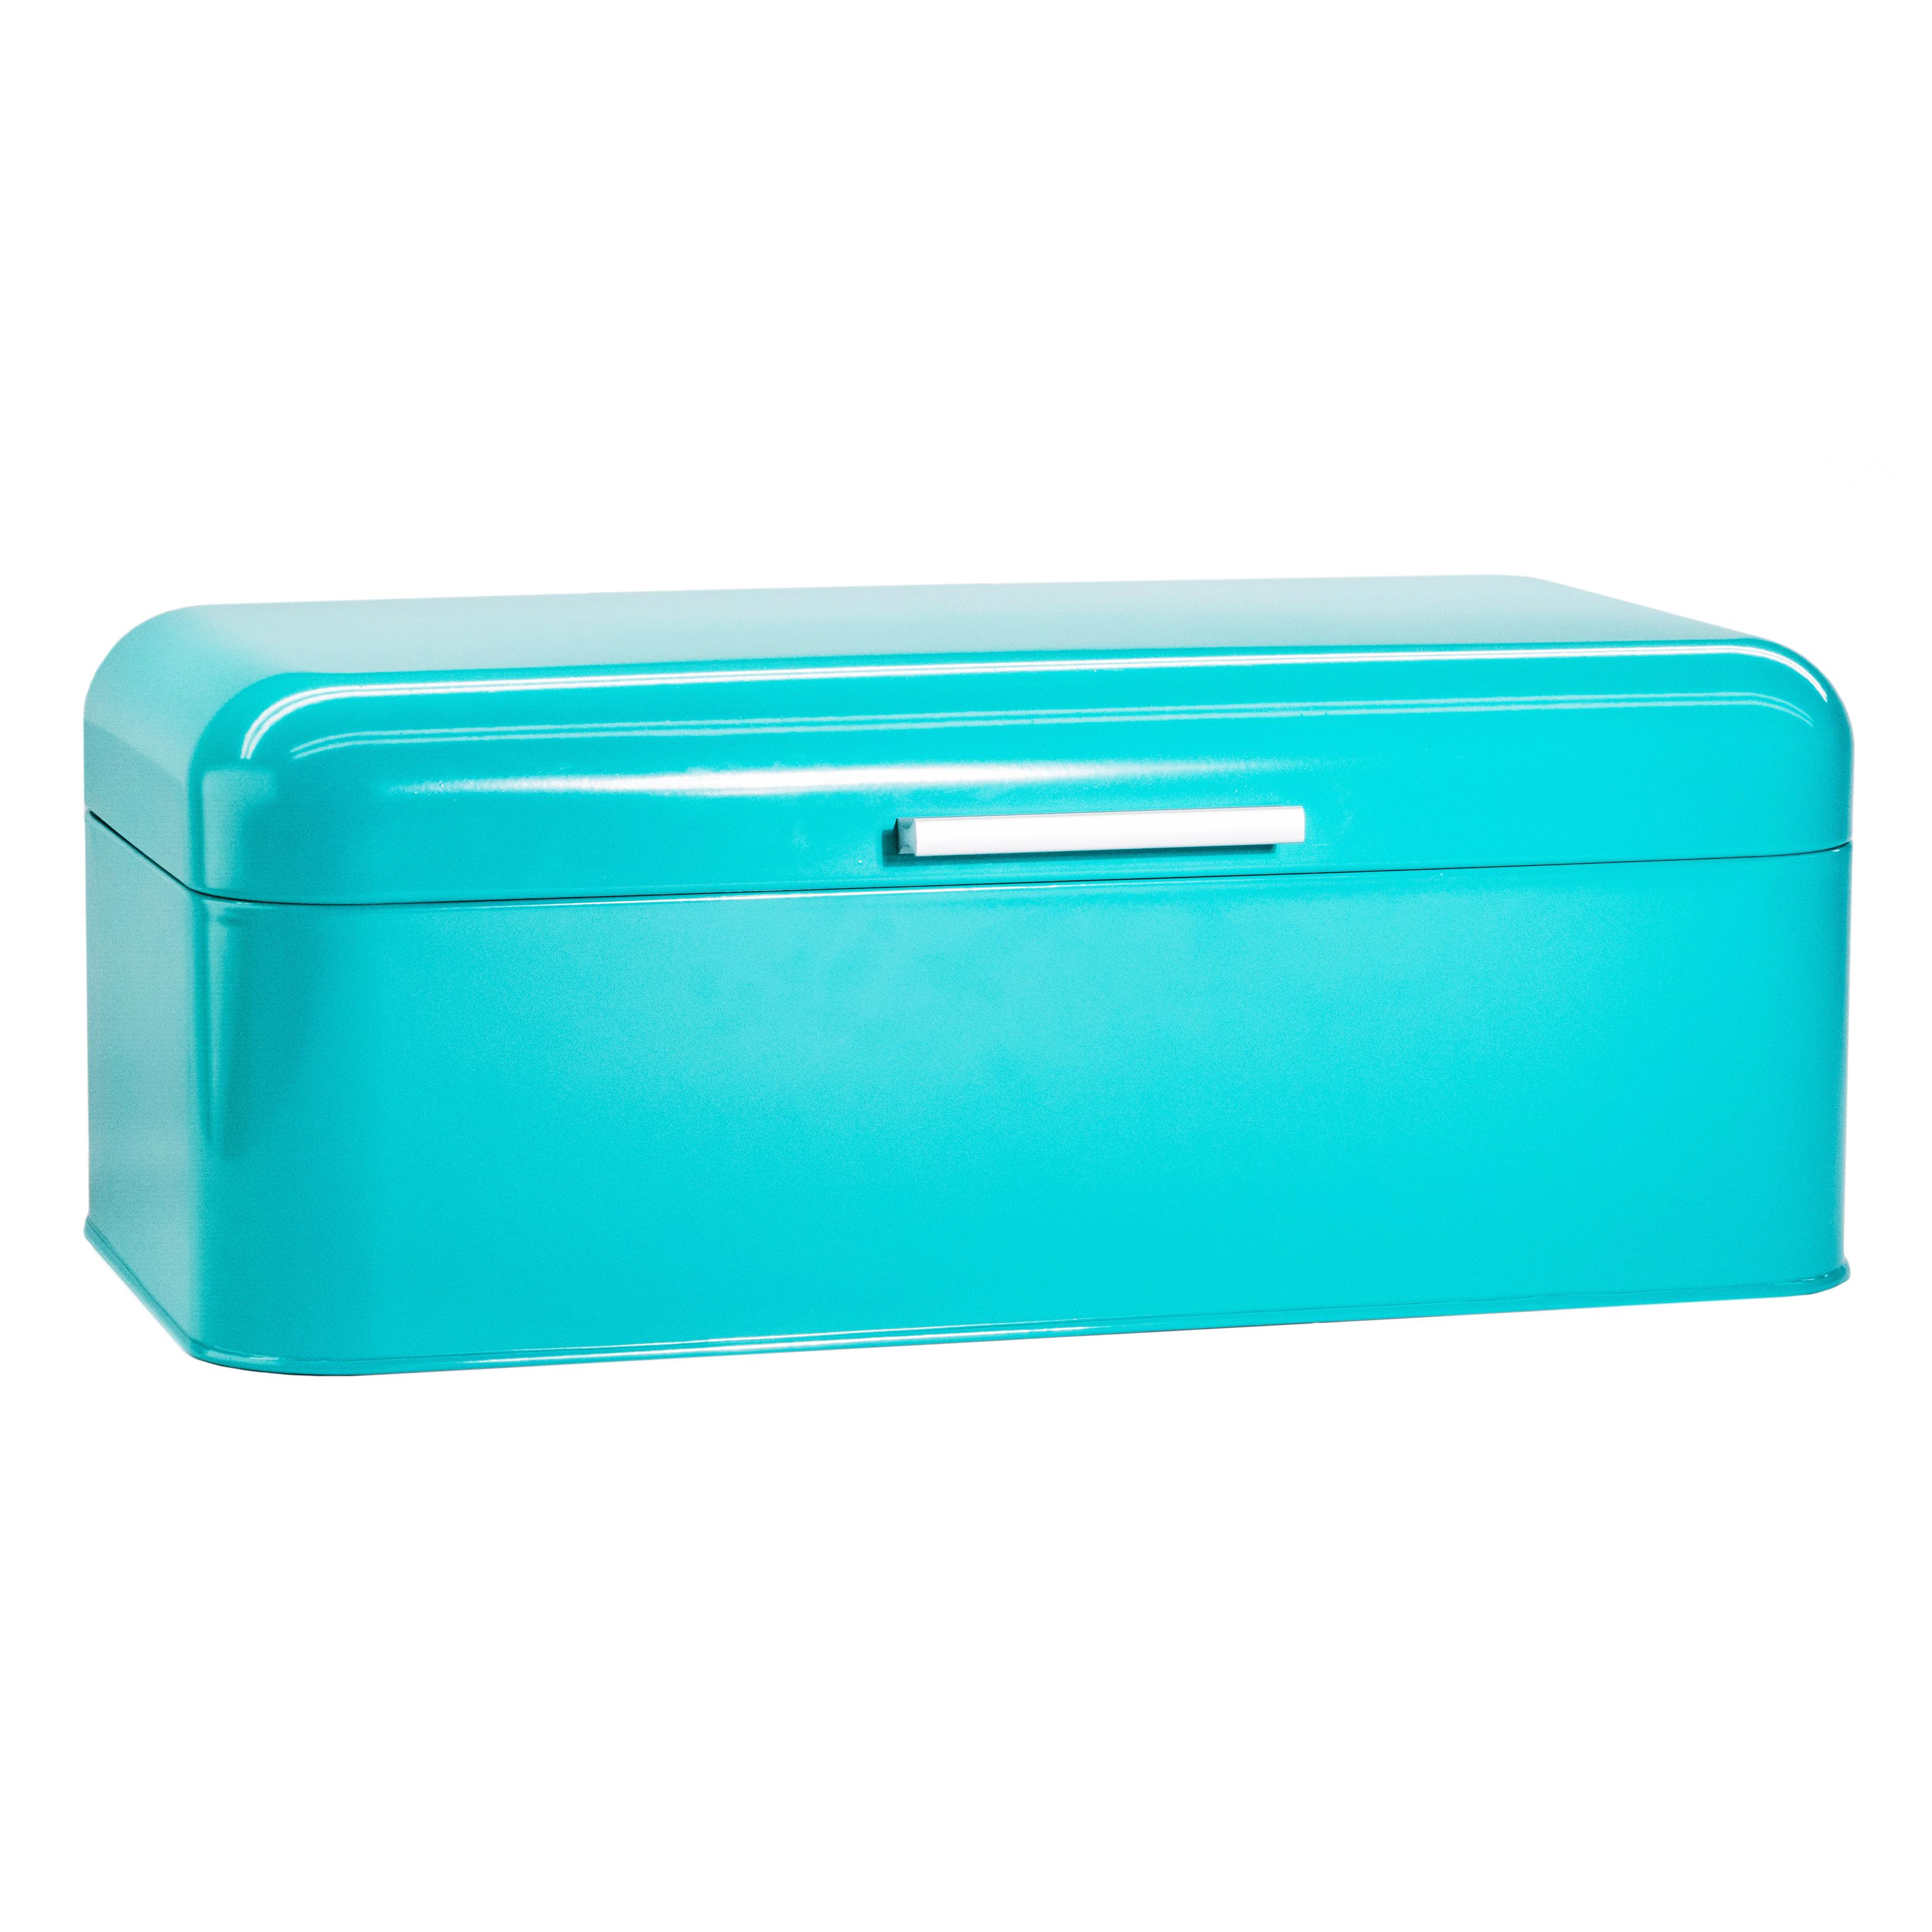 Turquoise Bread Box Bin